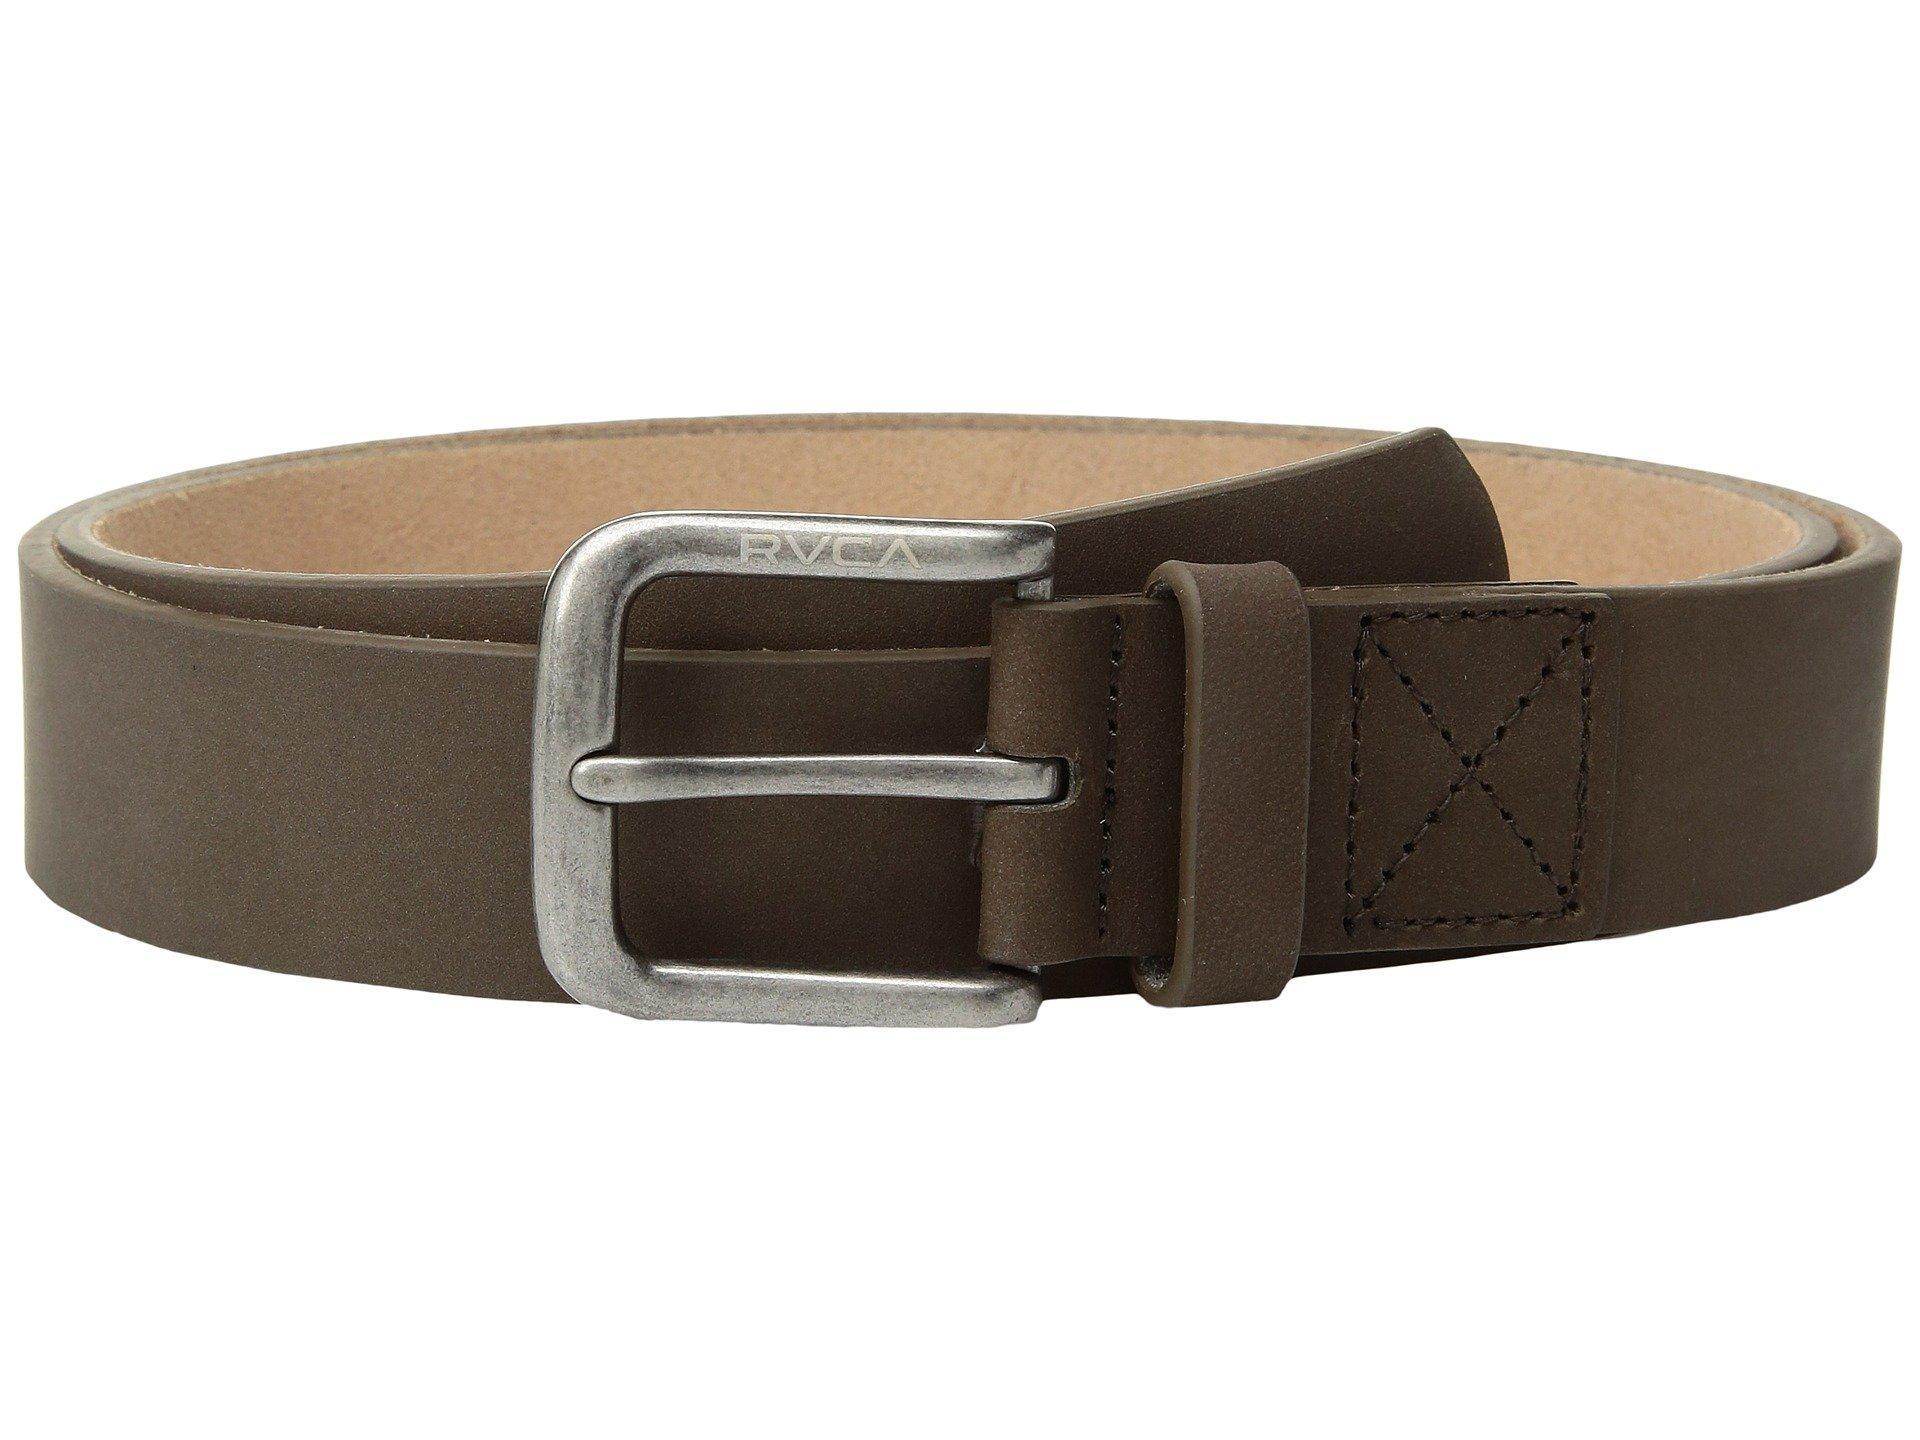 Rvca Bundy Leather Belt, Dark Brown